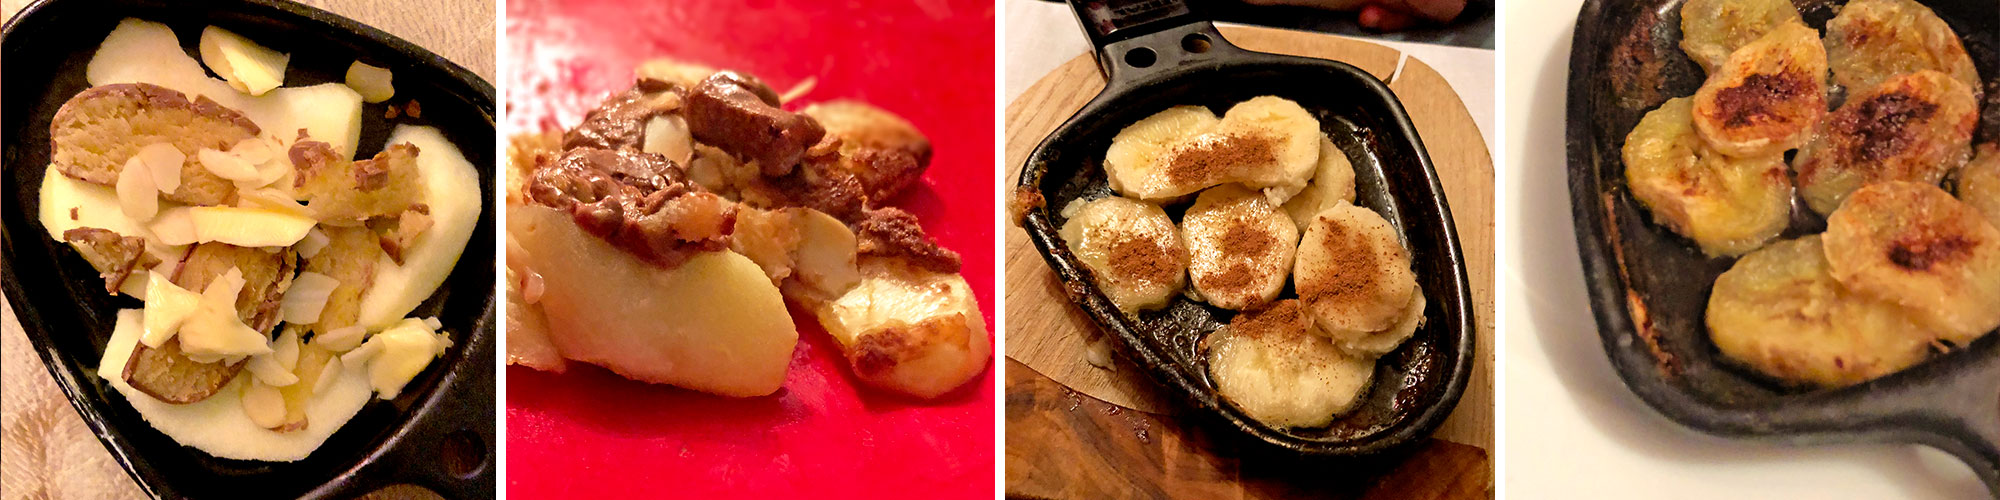 Raclettepfännchen süß / Dessert